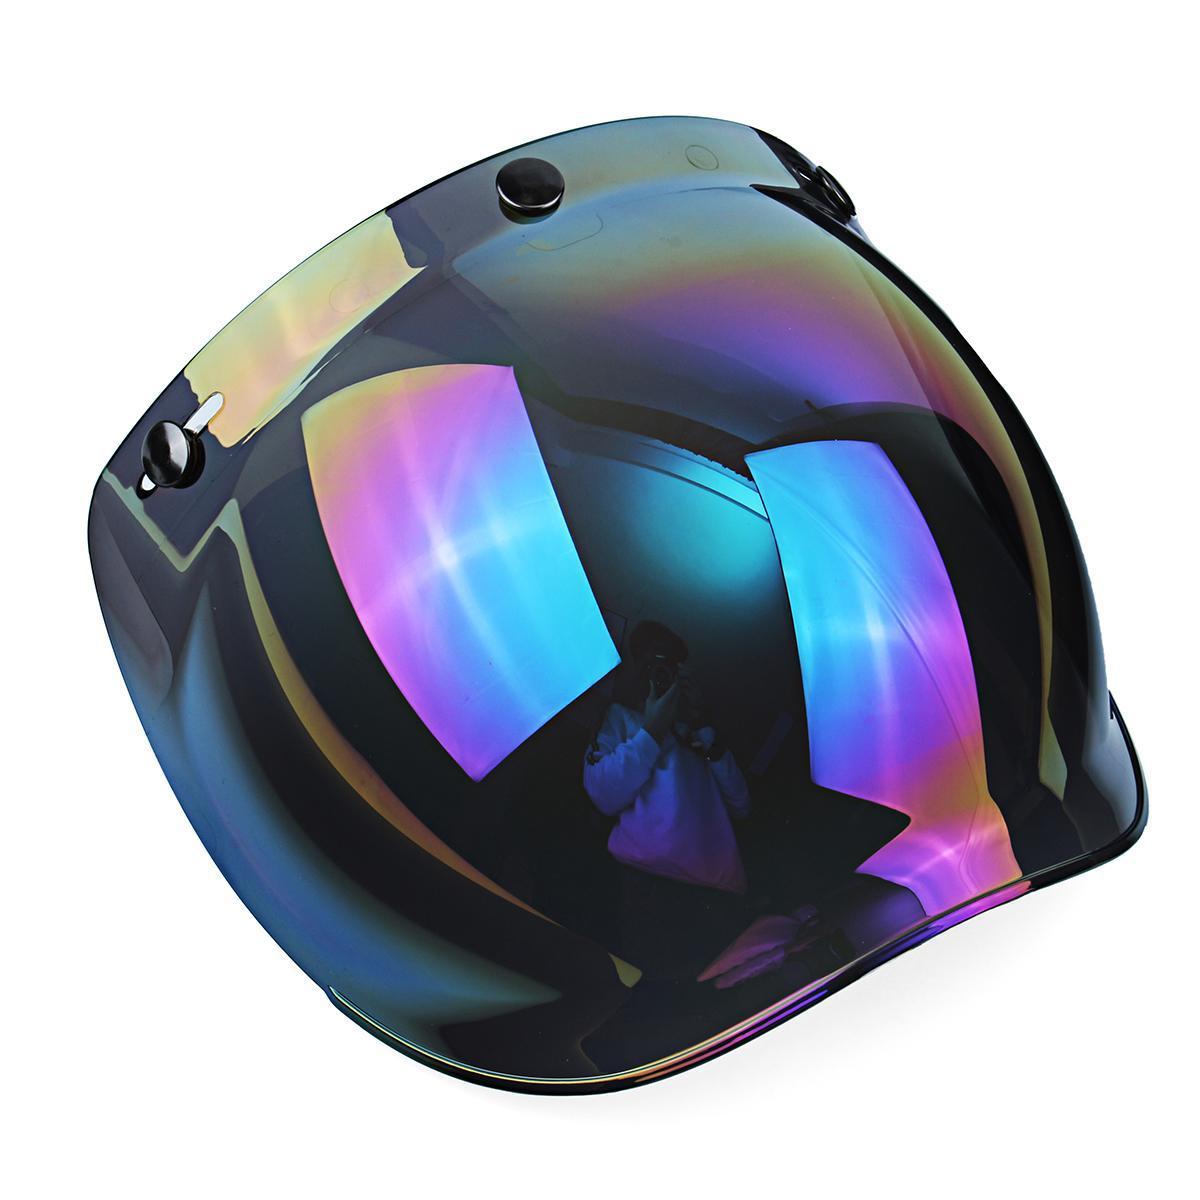 86328724 1 Set 3-Snap Sunglasses Motorcycle Helmet Bubble Visor Lens Windproof Retro  Motorbike Bubble Shield